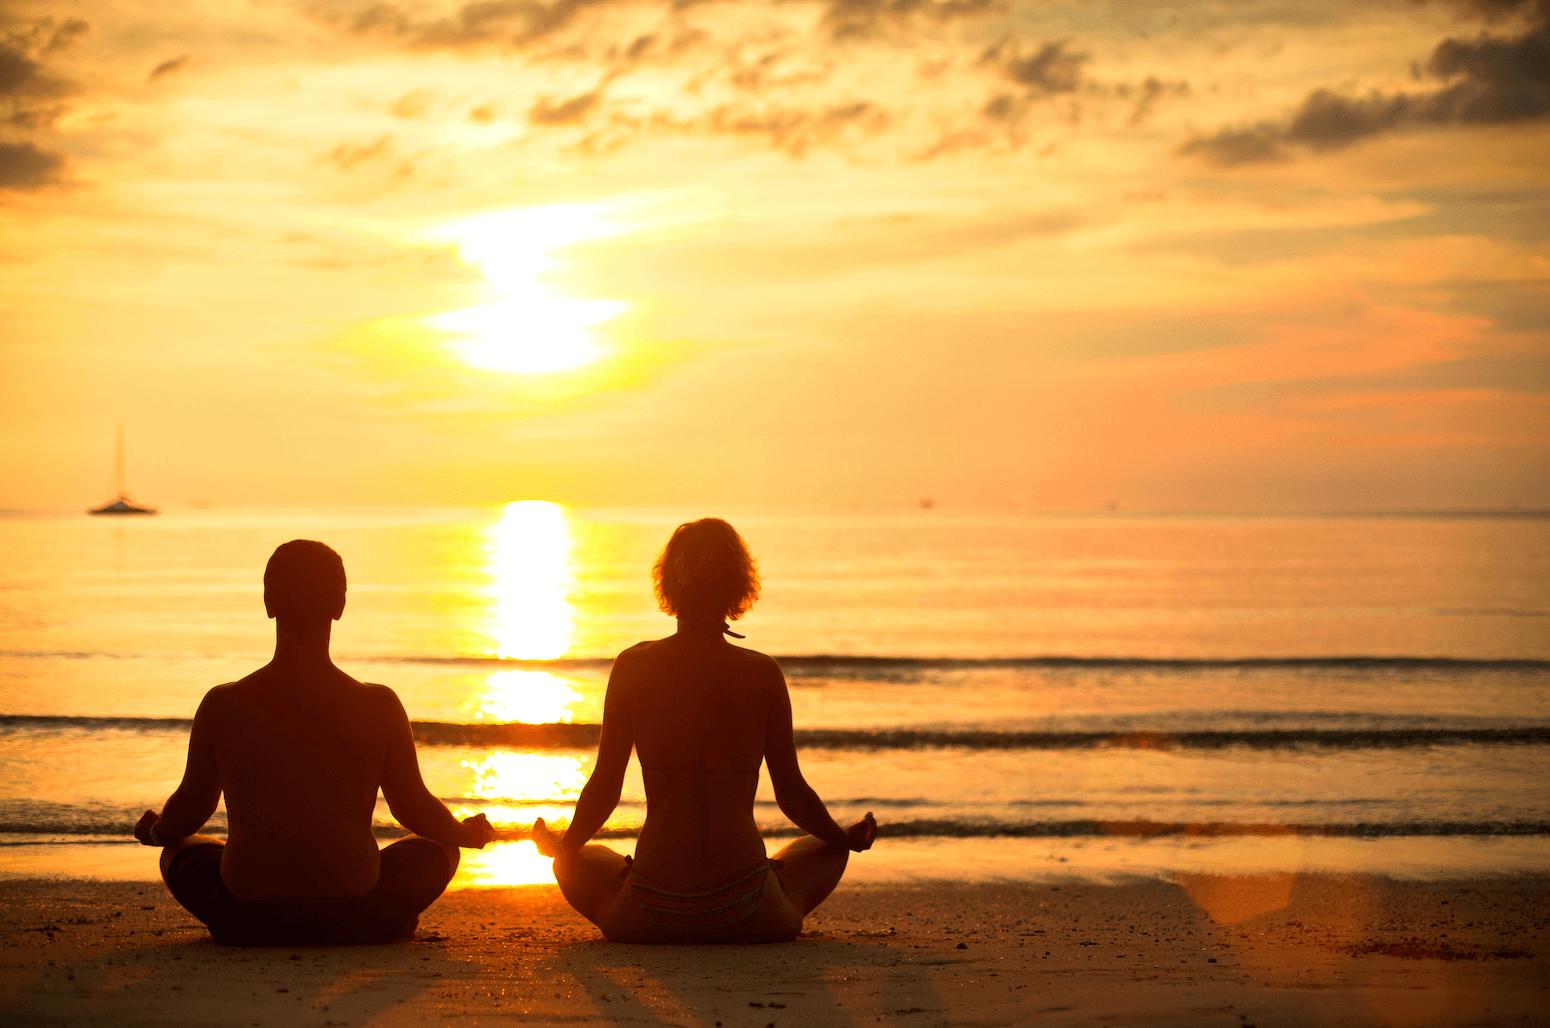 NeuroBe_Sunset Meditation.png